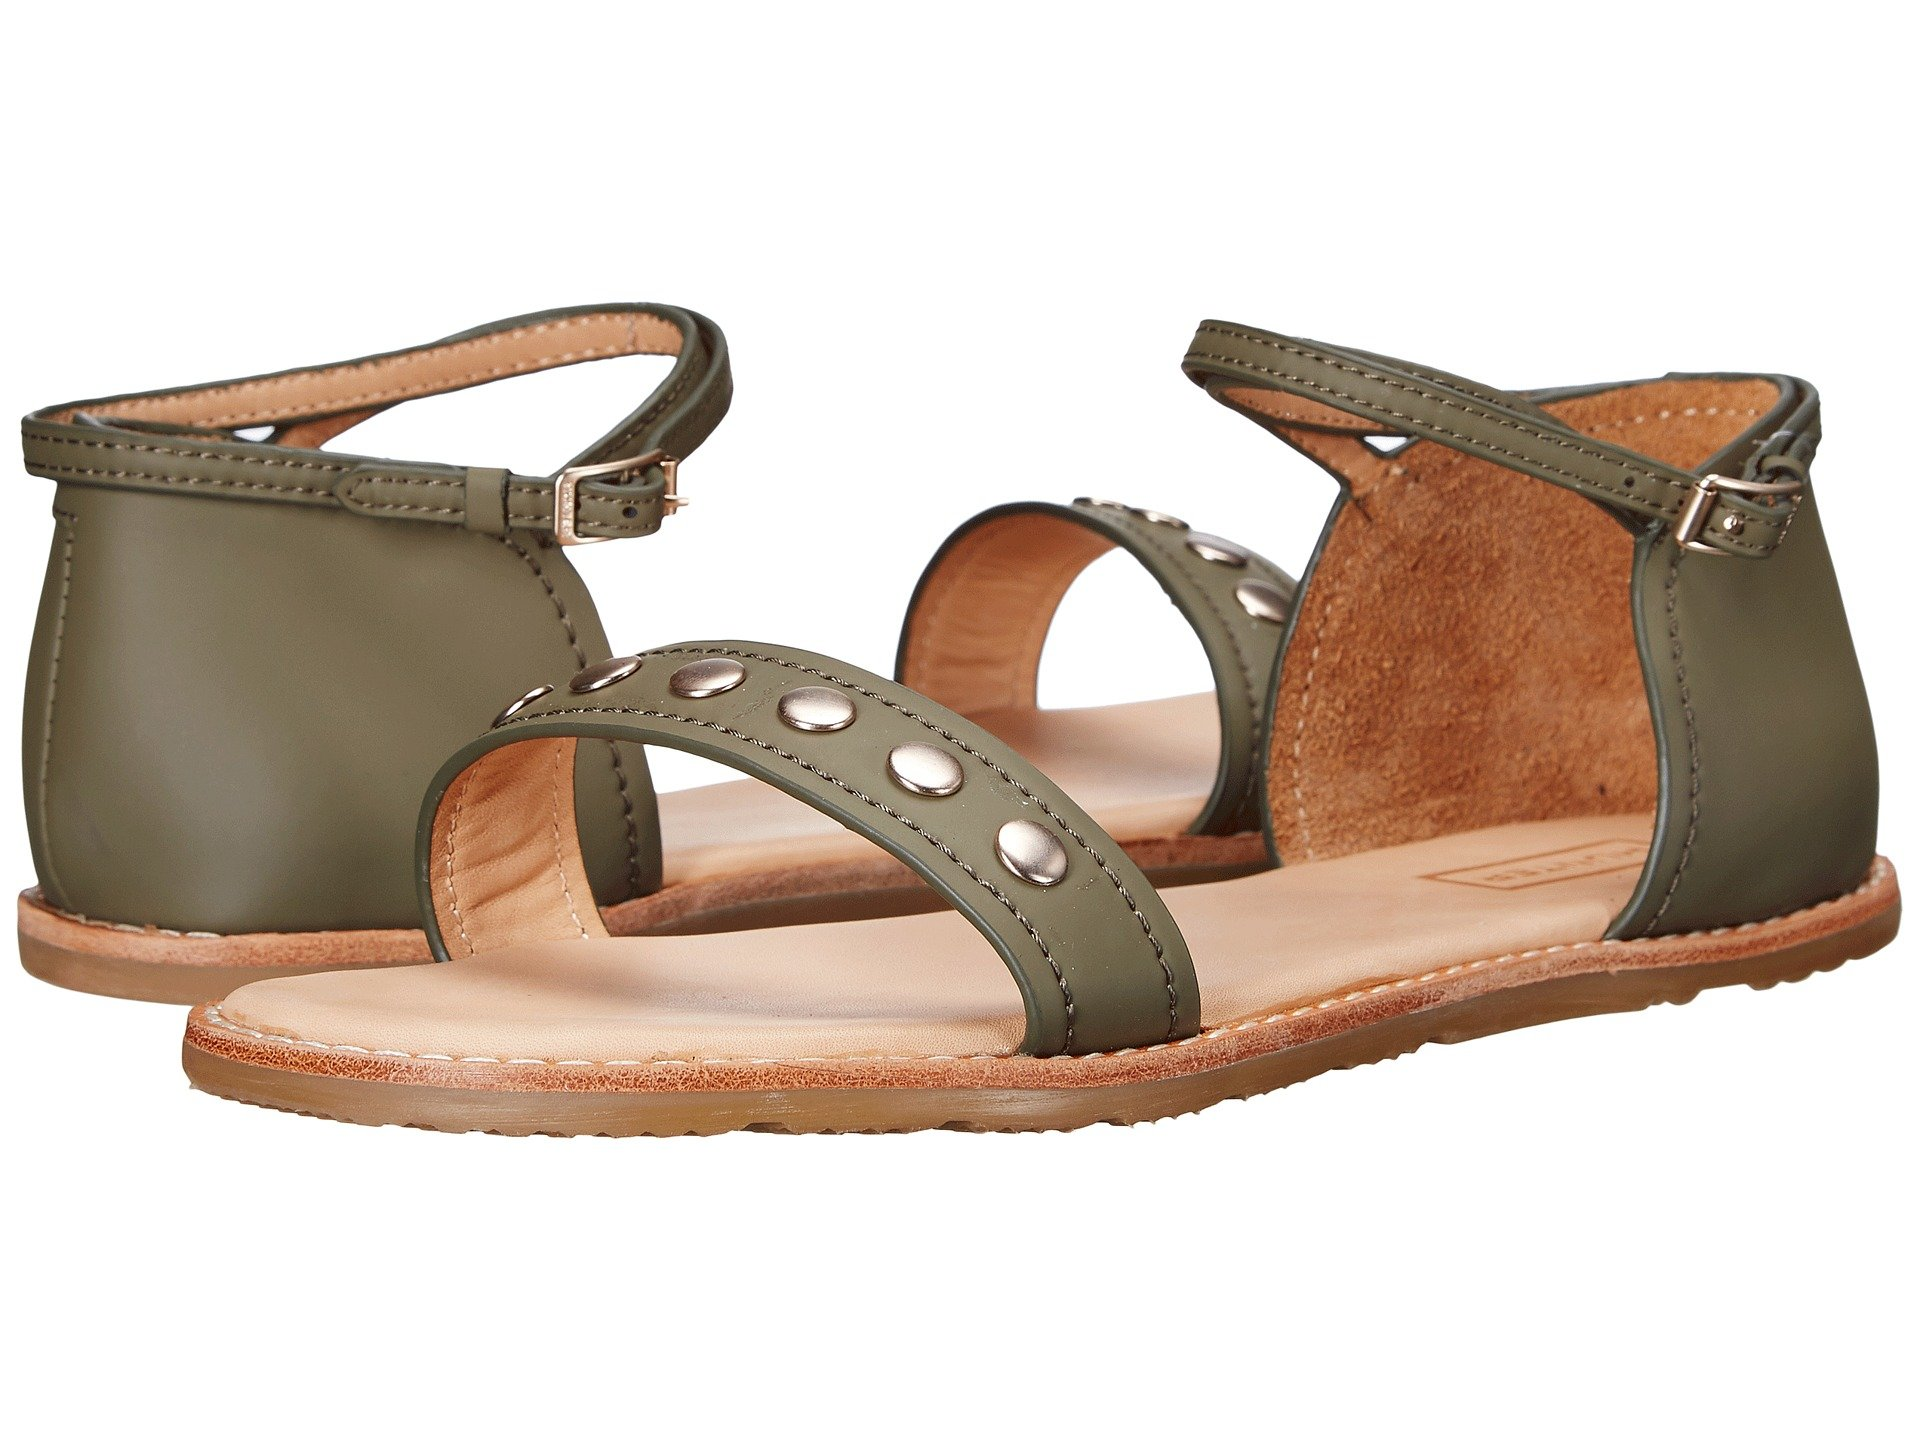 Original Leather Studded Sandal